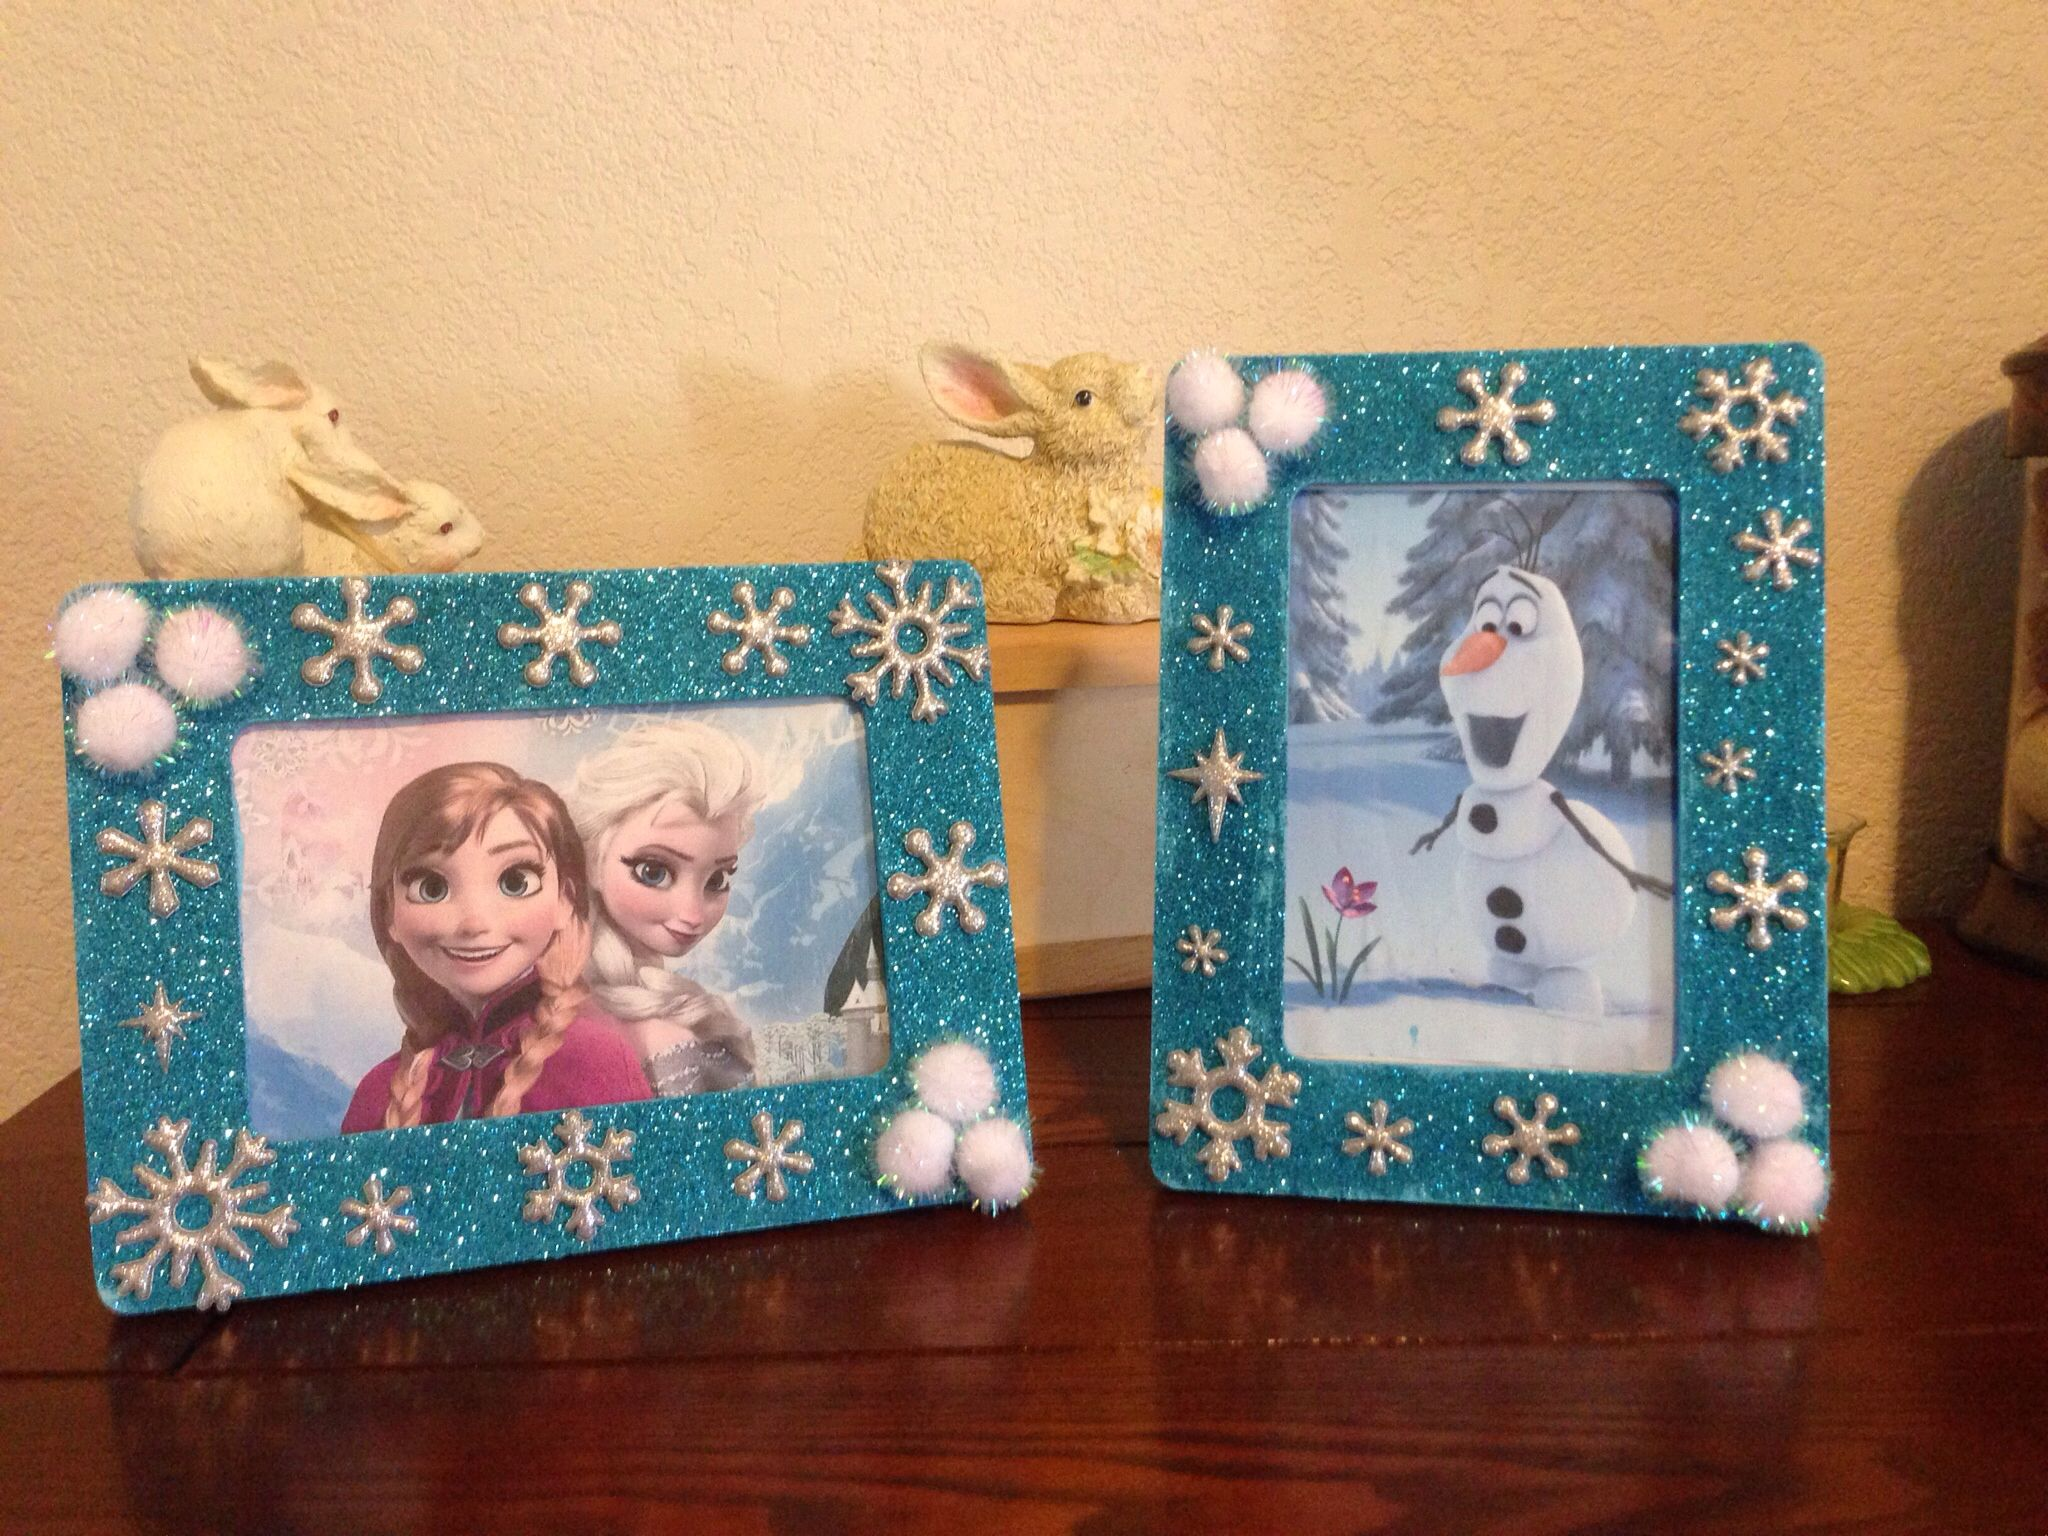 Disney Frozen Party DIY table decorations - Elsa & Anna - Olaf. I ...